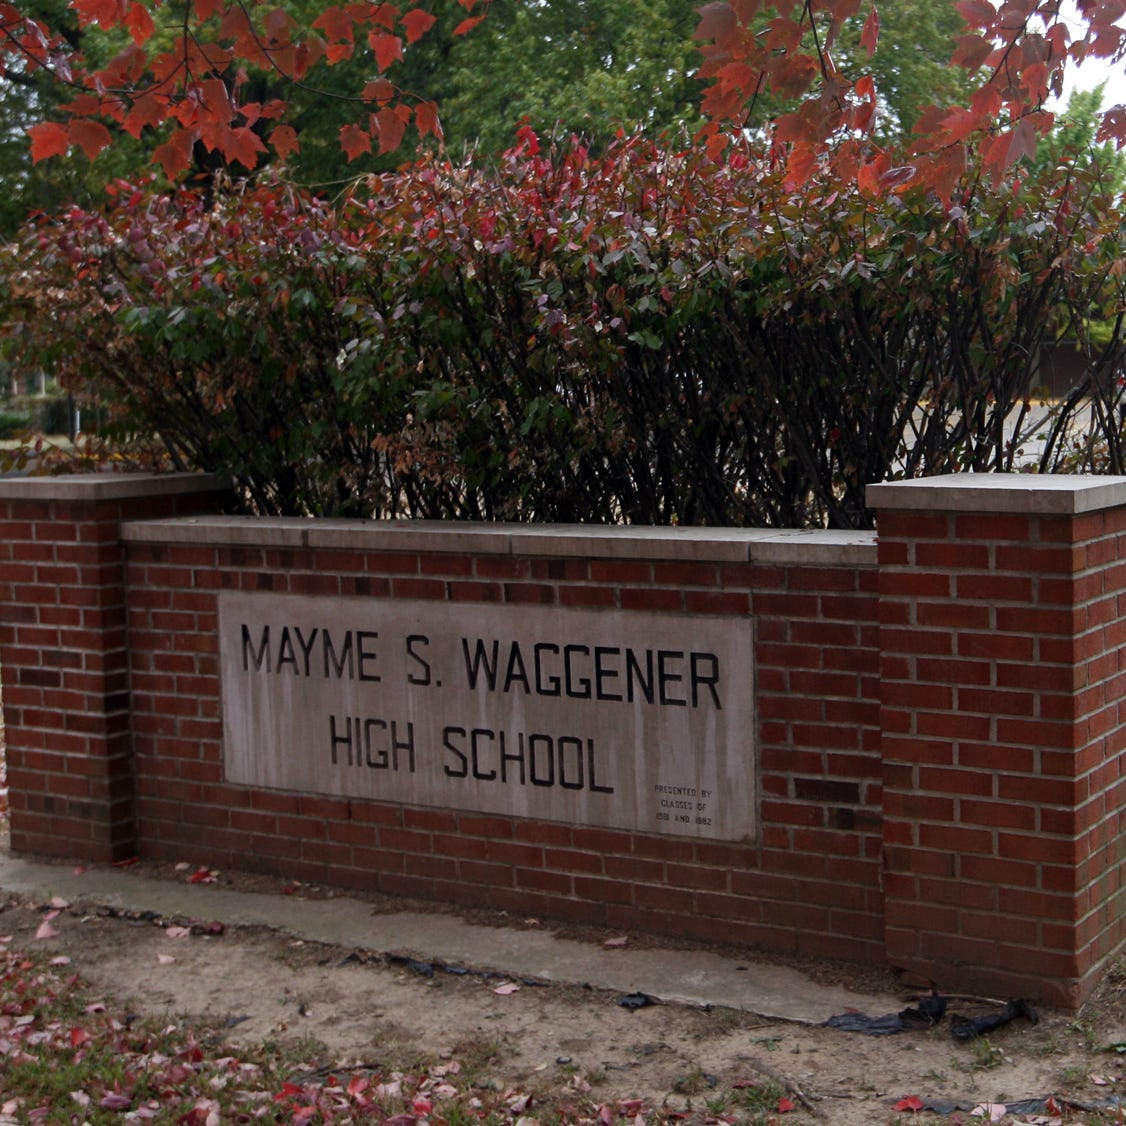 Waggener High School on Hubbards Lane